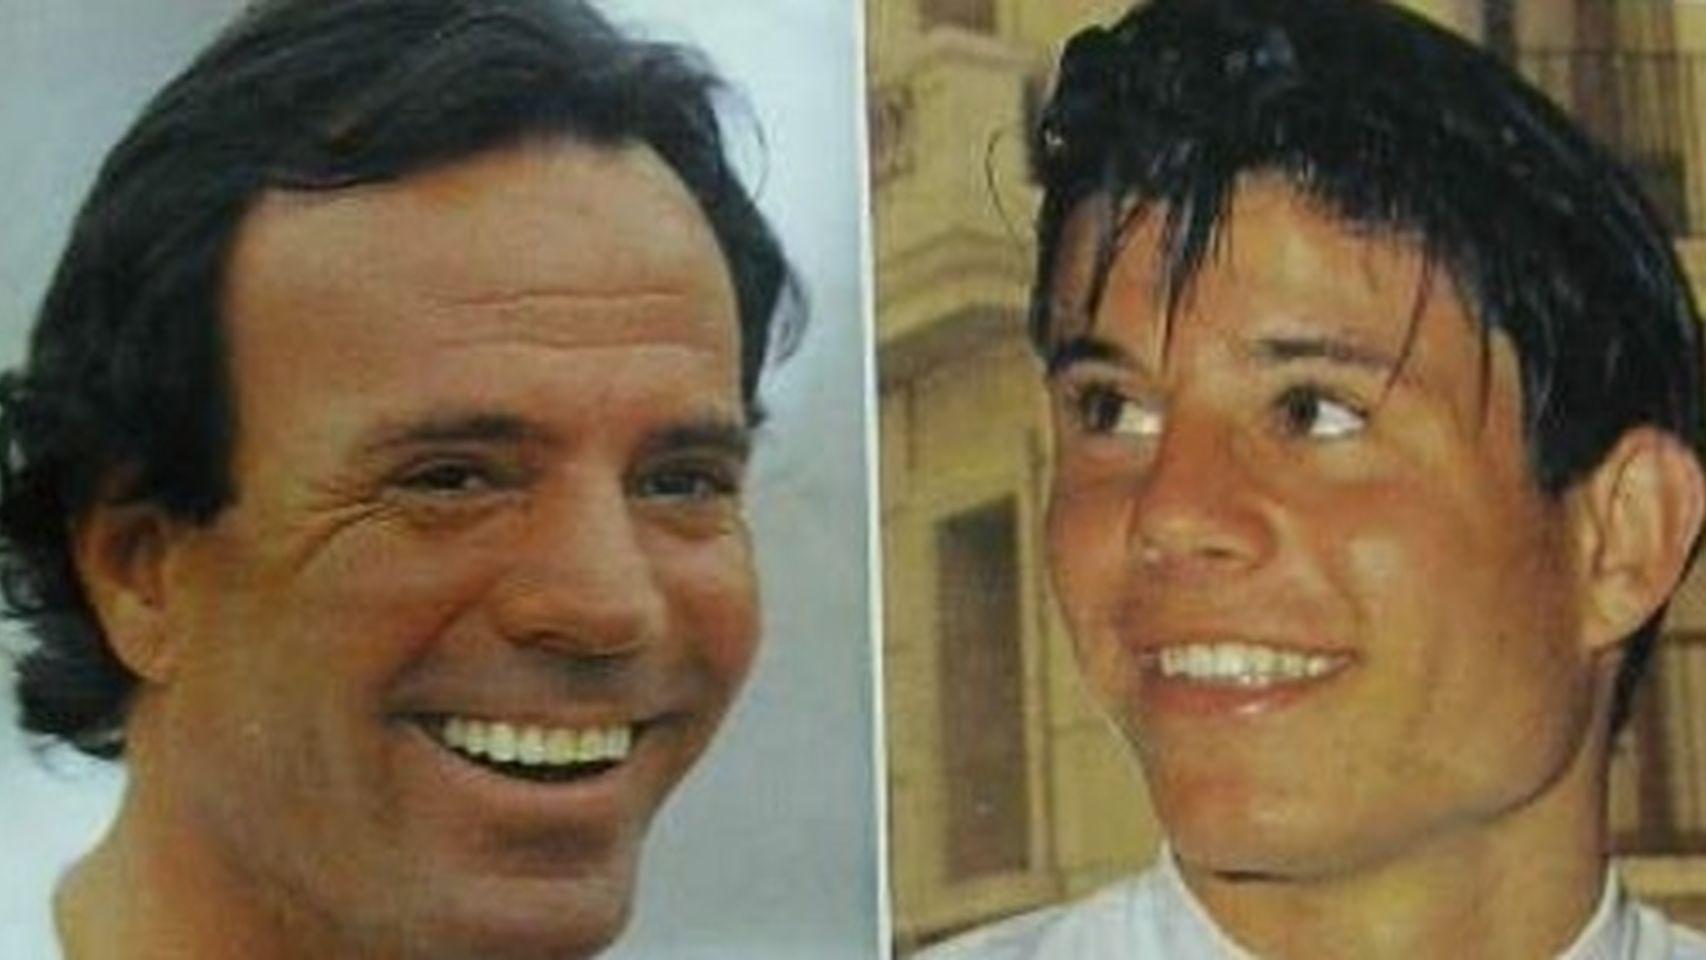 Julio_Iglesias-Hijos_de_famosos-Paternidad-Famosos_229238311_38666242_1706x960.jpg